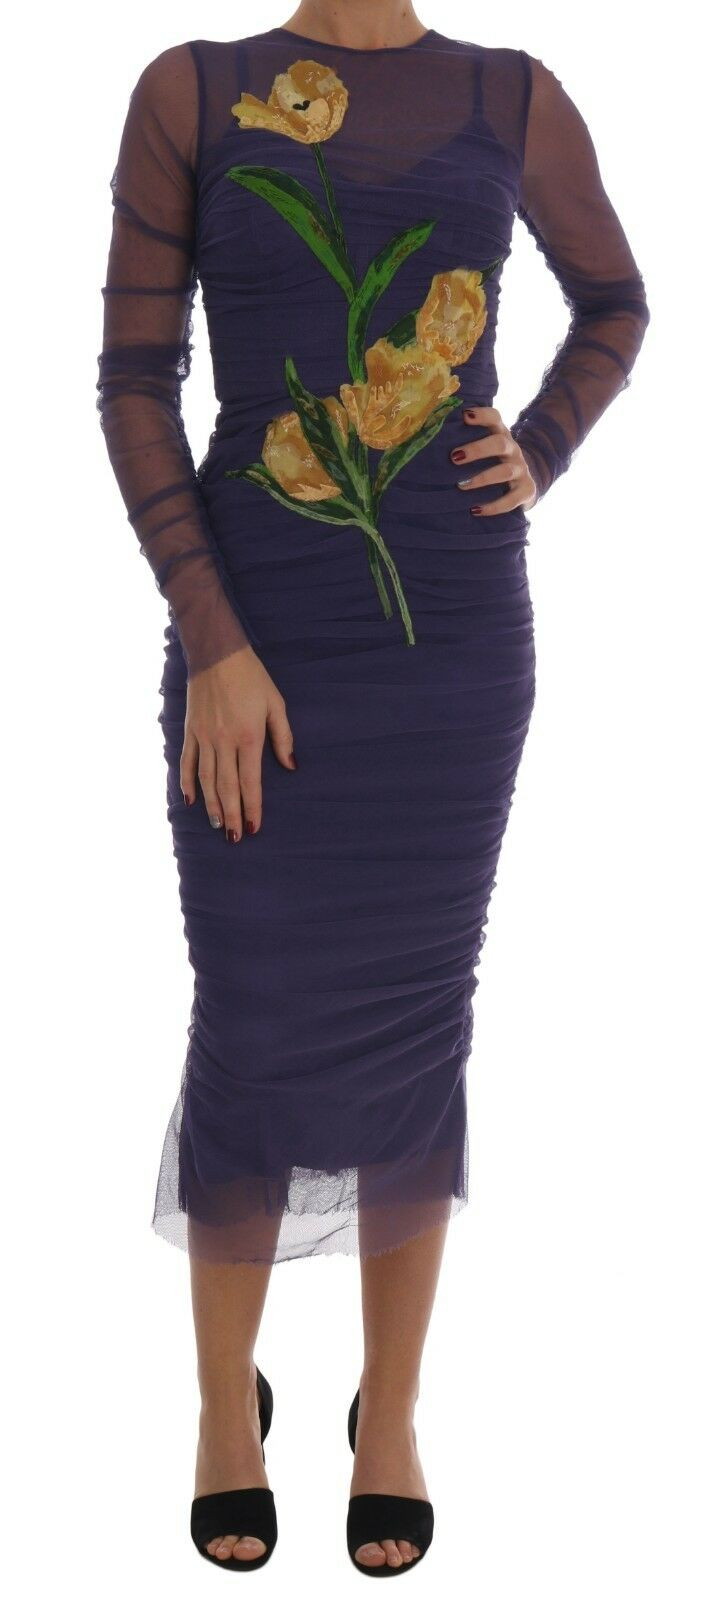 Dolce & Gabbana Women's Floral Tulip Stretch Sheath Dress Purple DR1330 - IT40|S